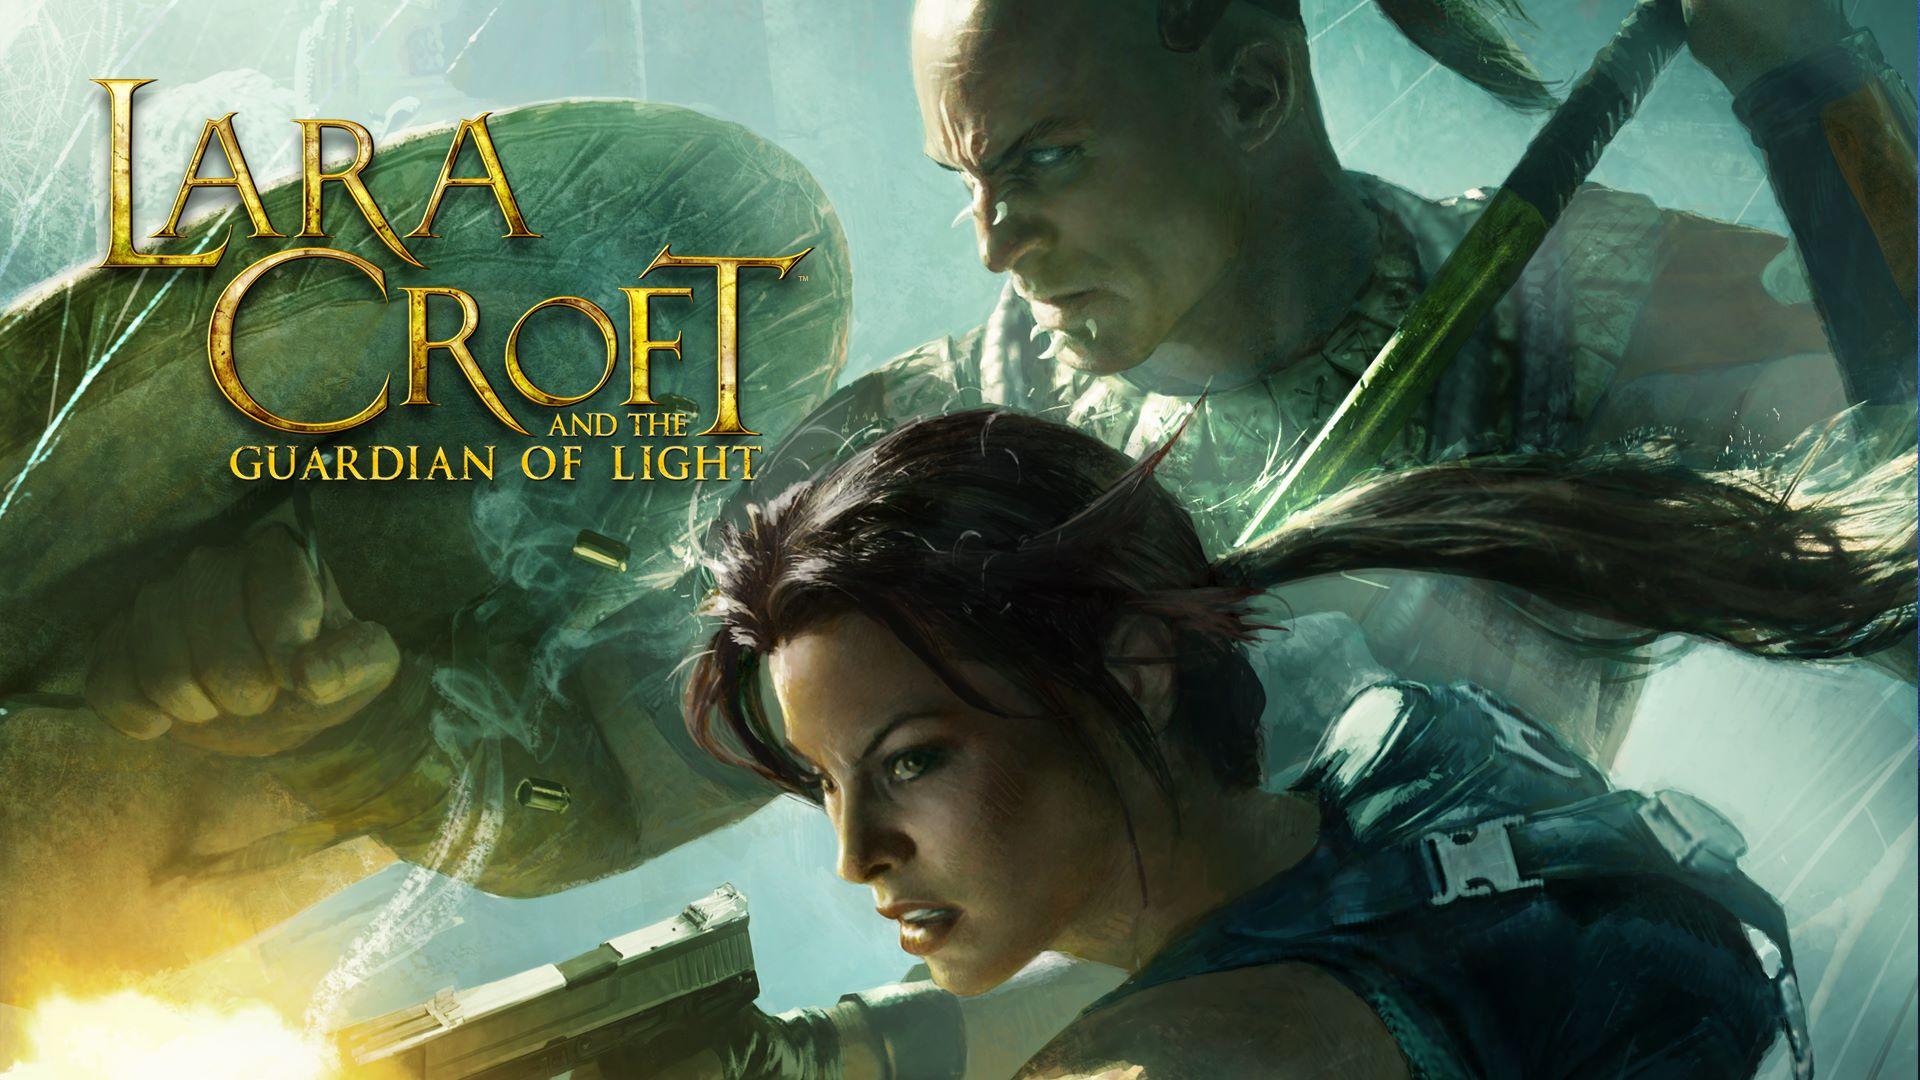 lara croft and the guardian of light skidrow